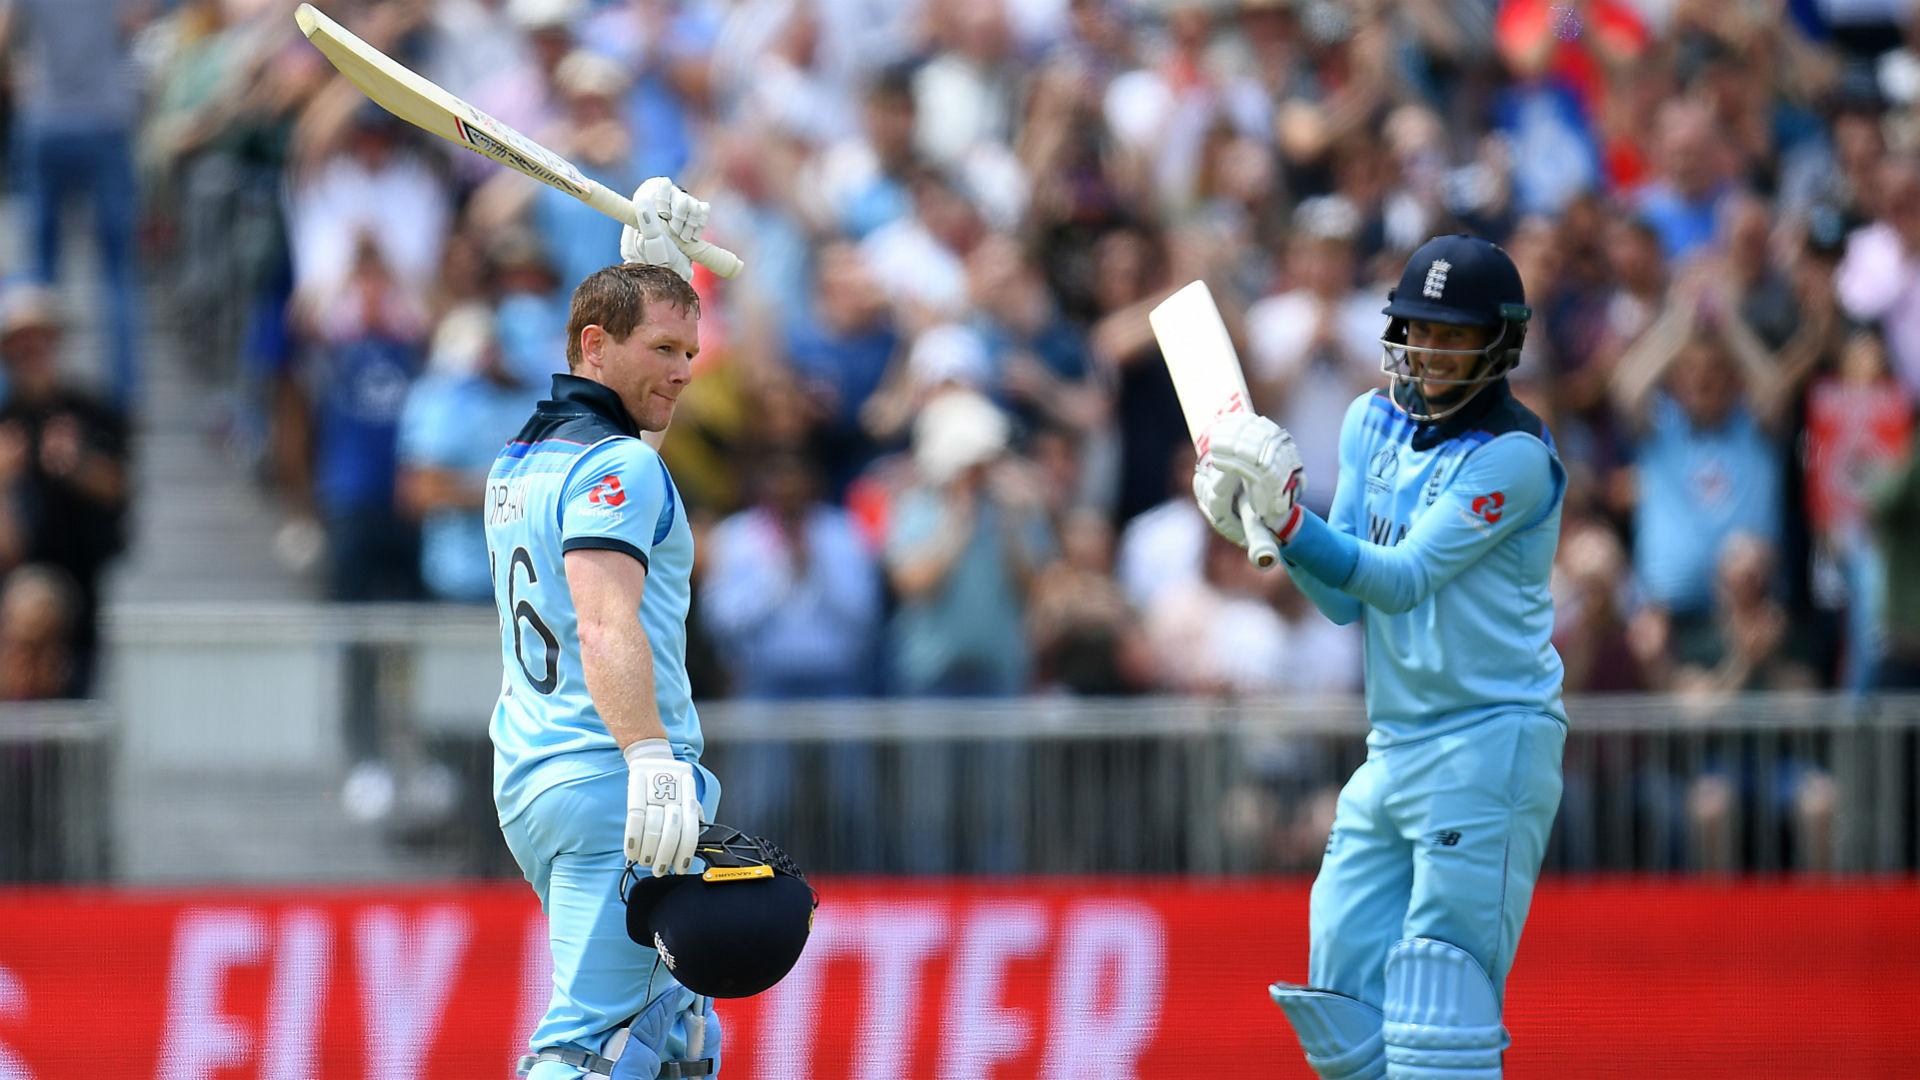 Morgan hits 17 sixes in England win